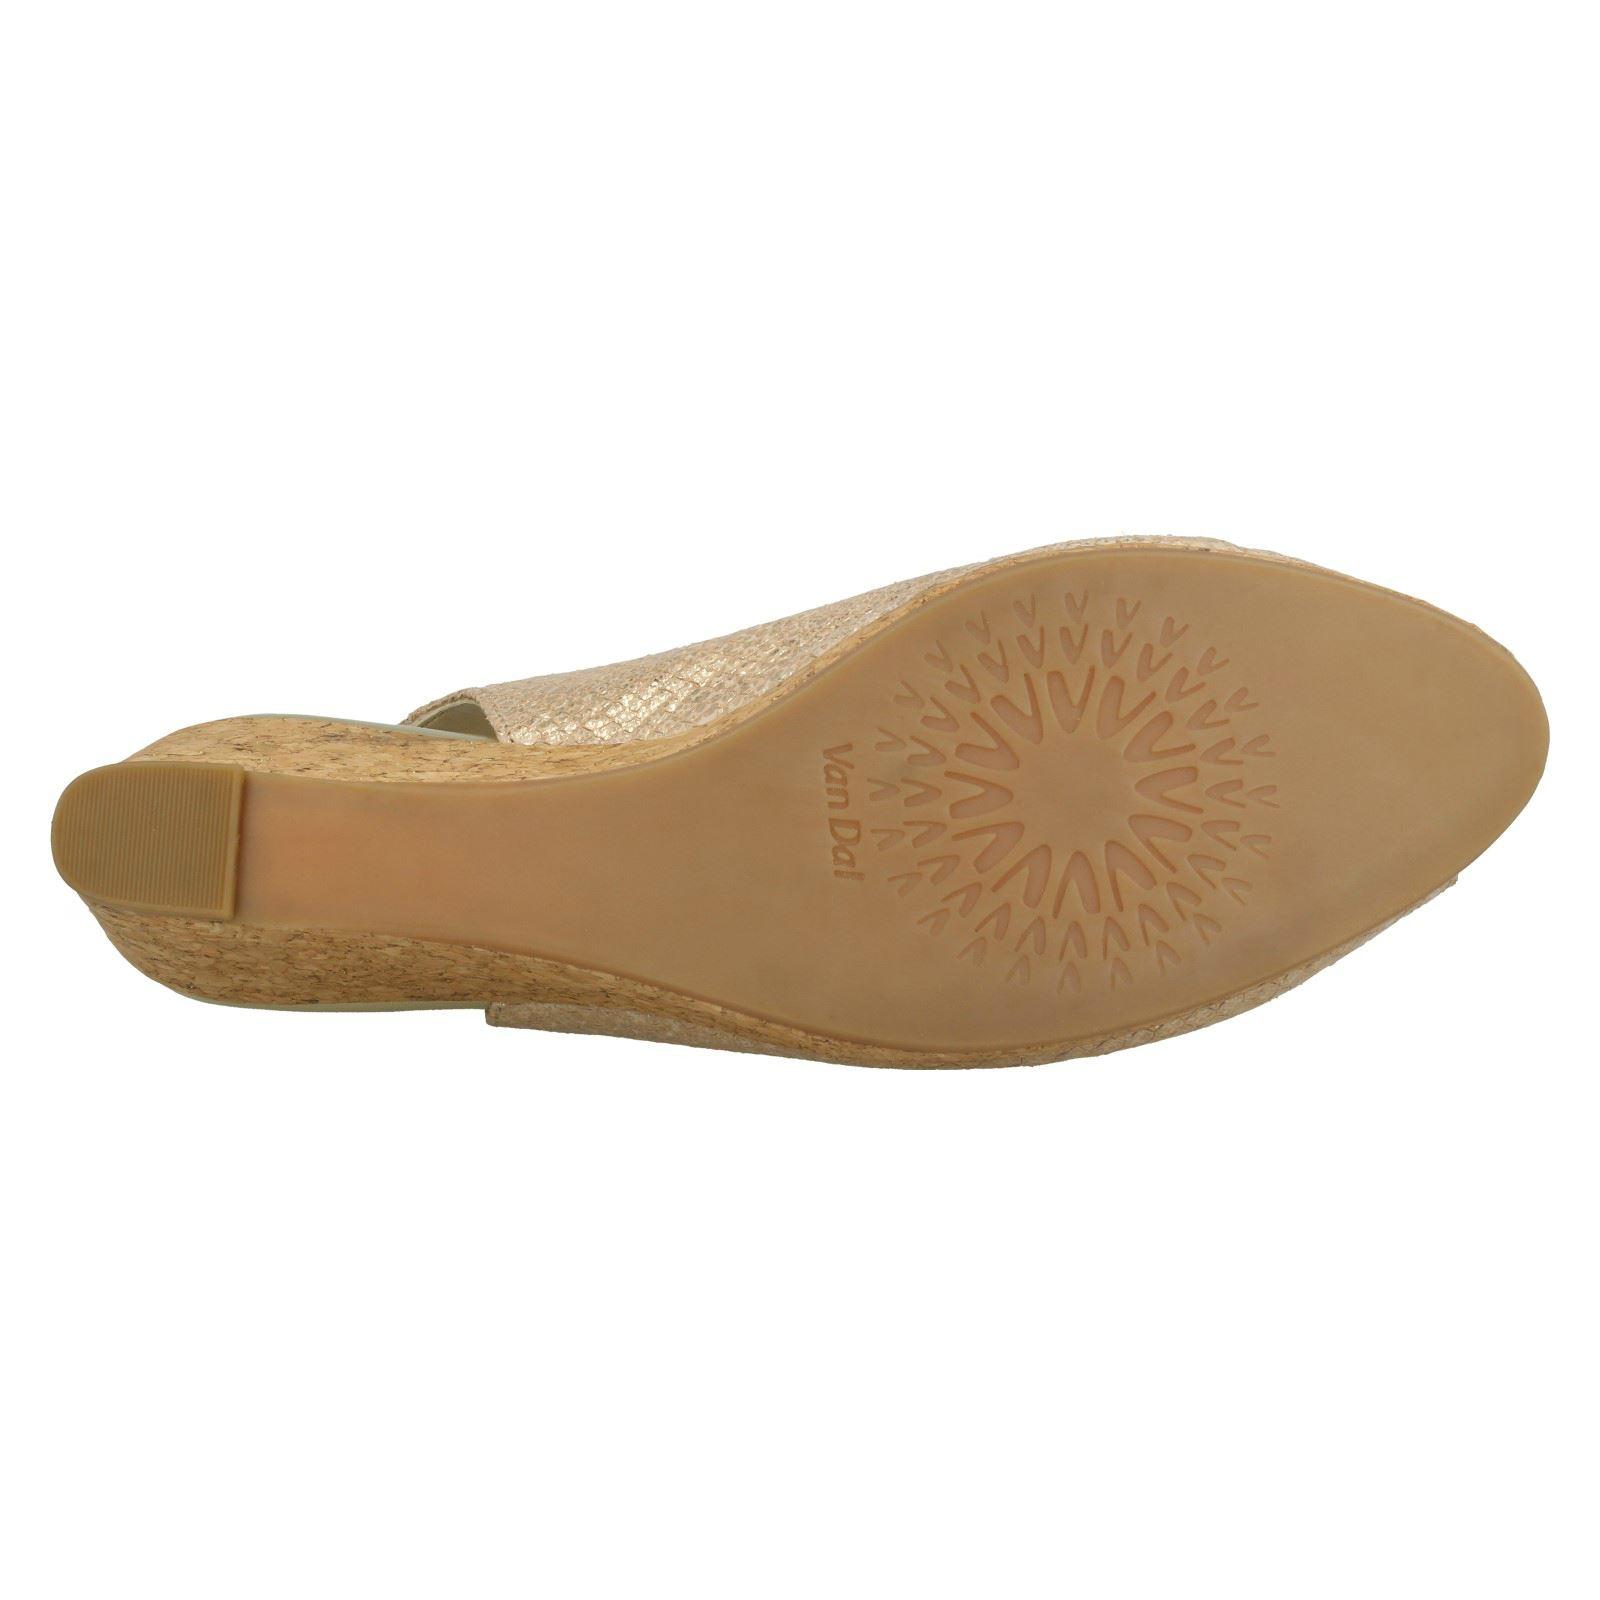 Ladies-Van-Dal-Cork-Wedge-Sandals-Gable thumbnail 10